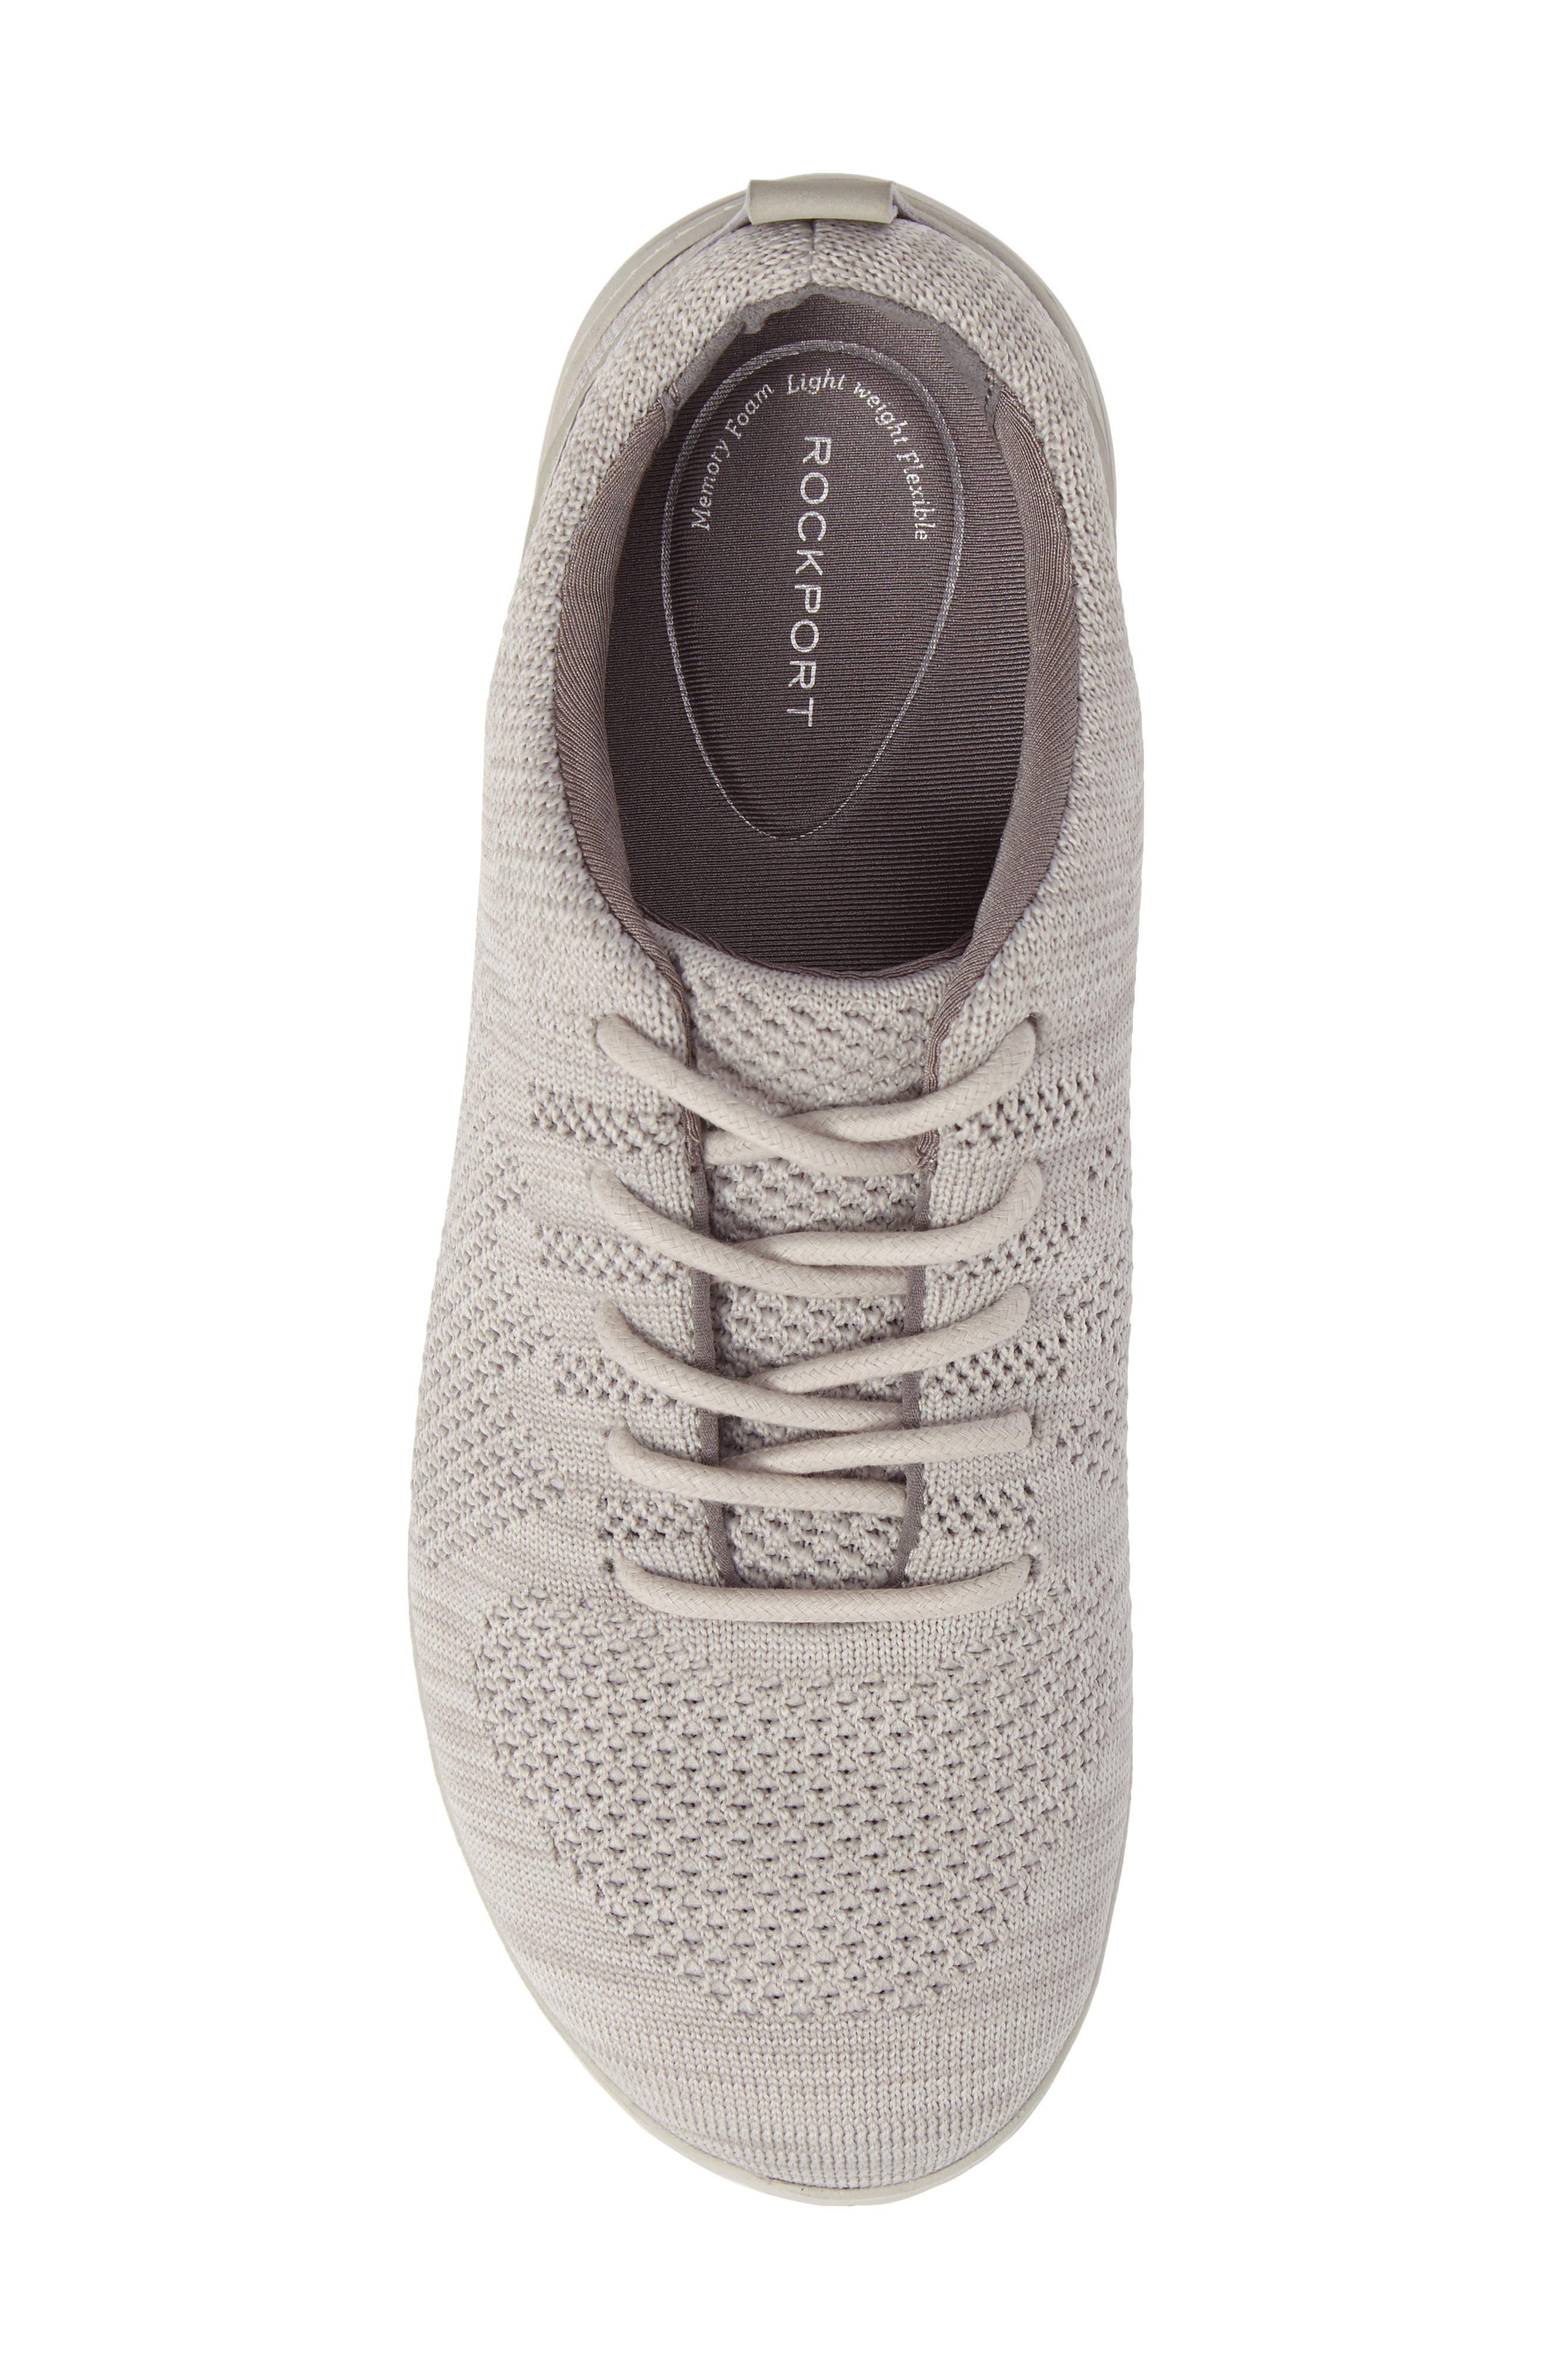 Raelyn Knit Sneaker,                             Alternate thumbnail 5, color,                             Cloud Fabric